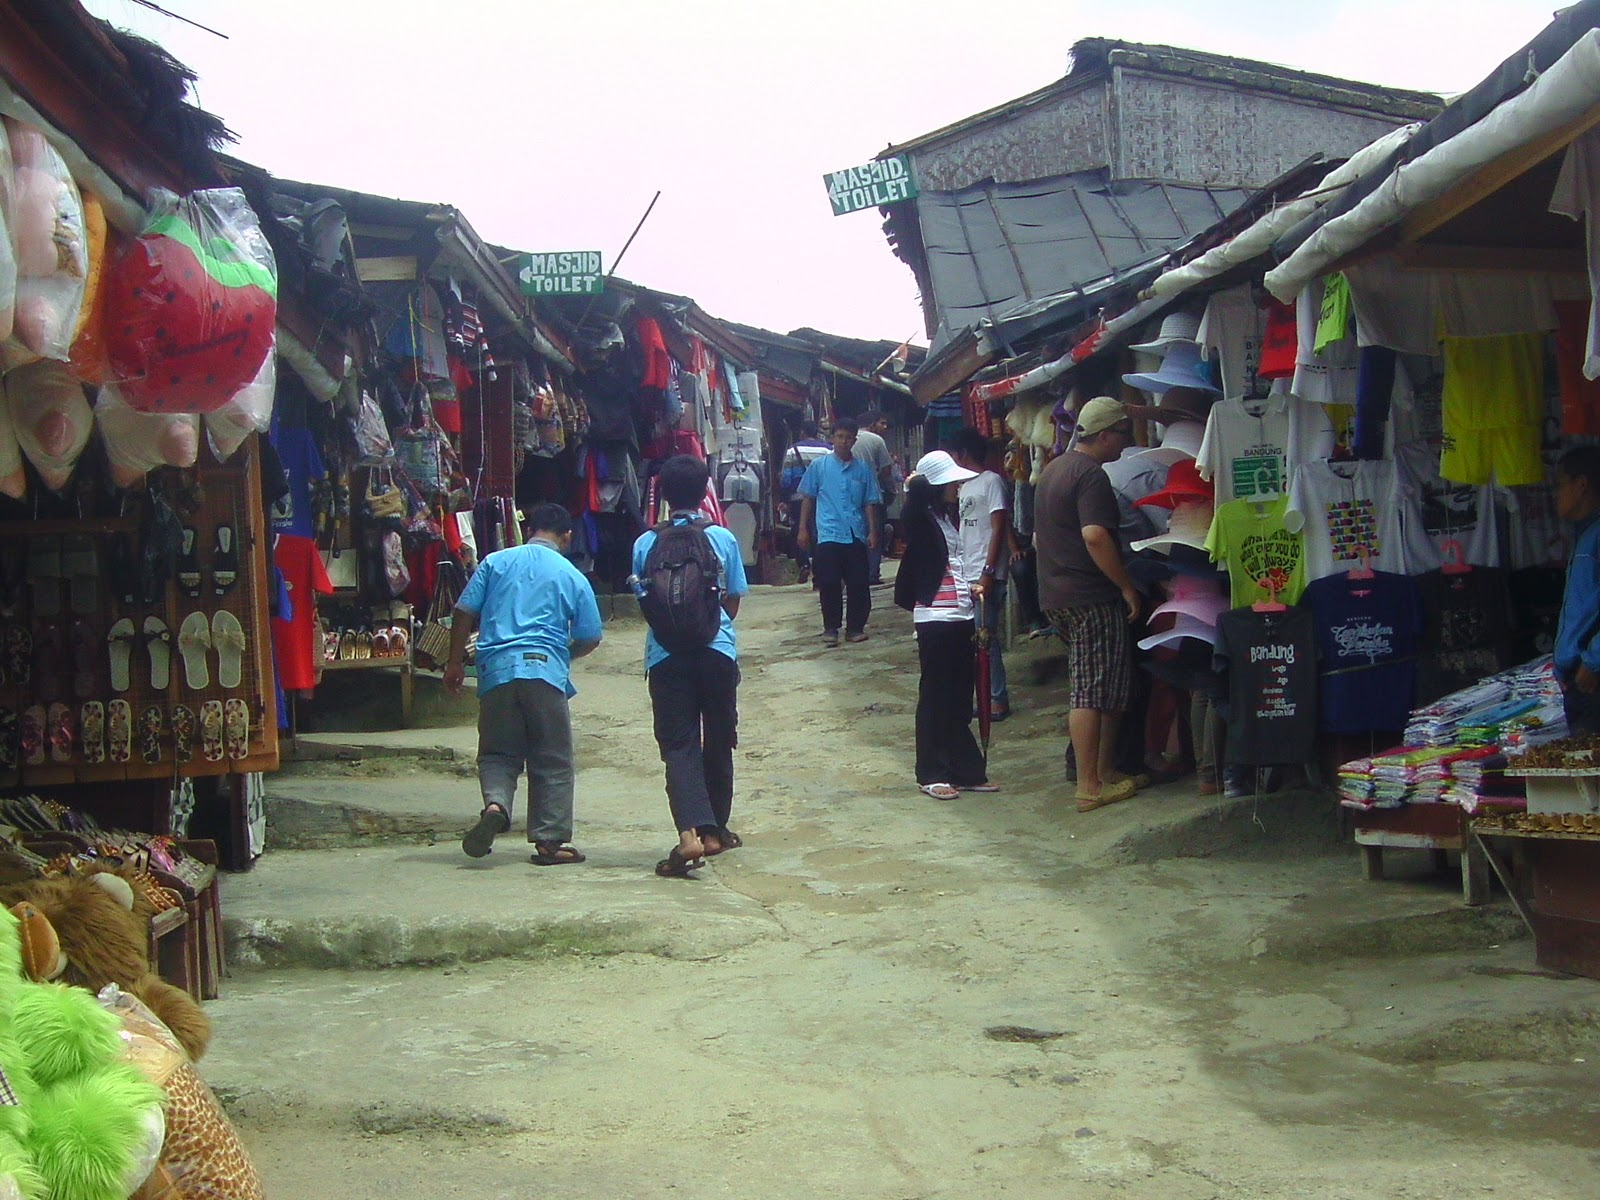 Peluang Usaha Baru di Bandung Modal Minim Peluang Bisnis di Bandung Sektor Non Industri